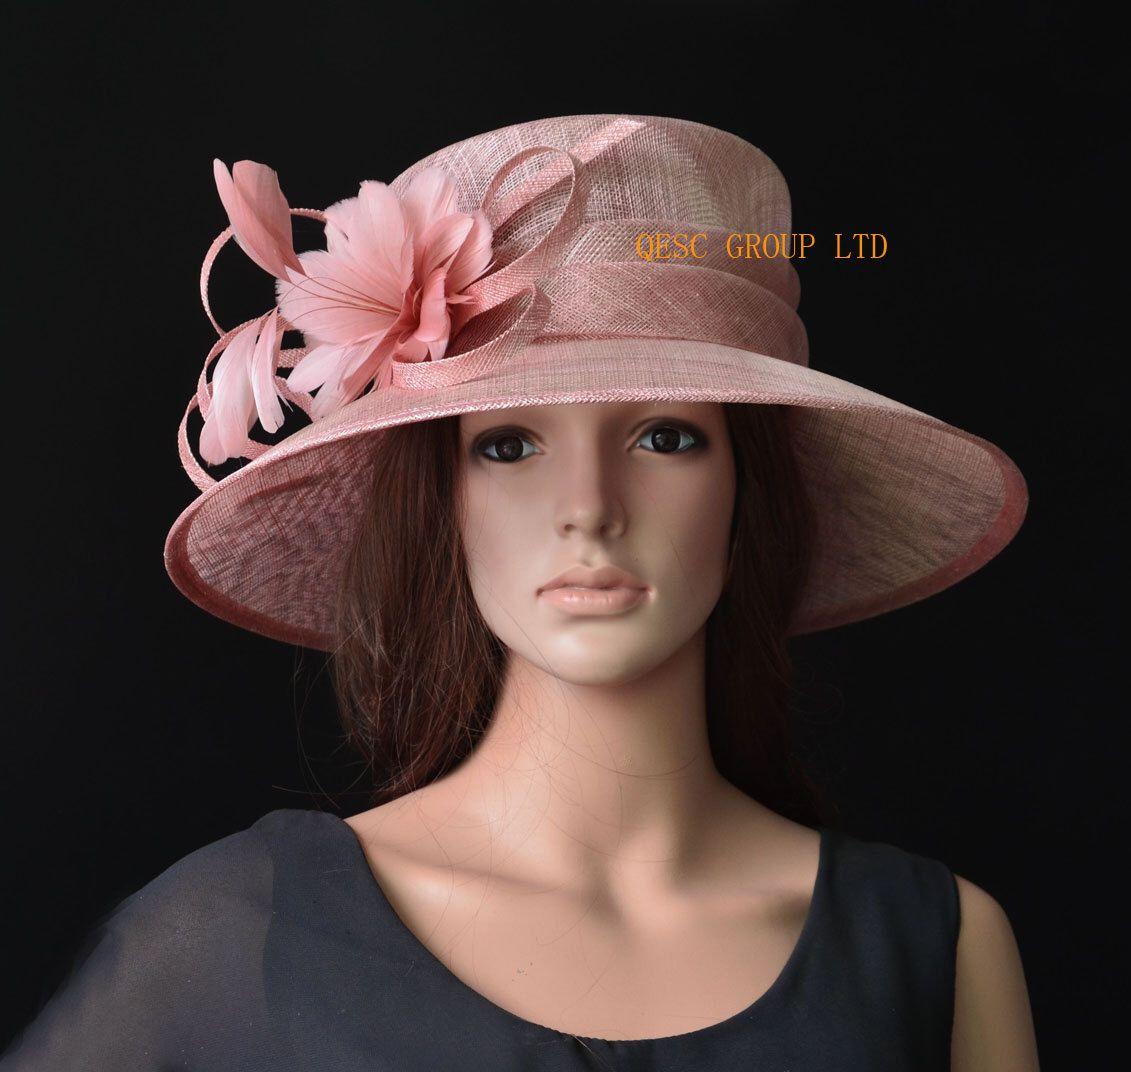 b6936d984ad Blush pink big brim sinamay hat Formal dress Hat church hat for Kentucky  derby